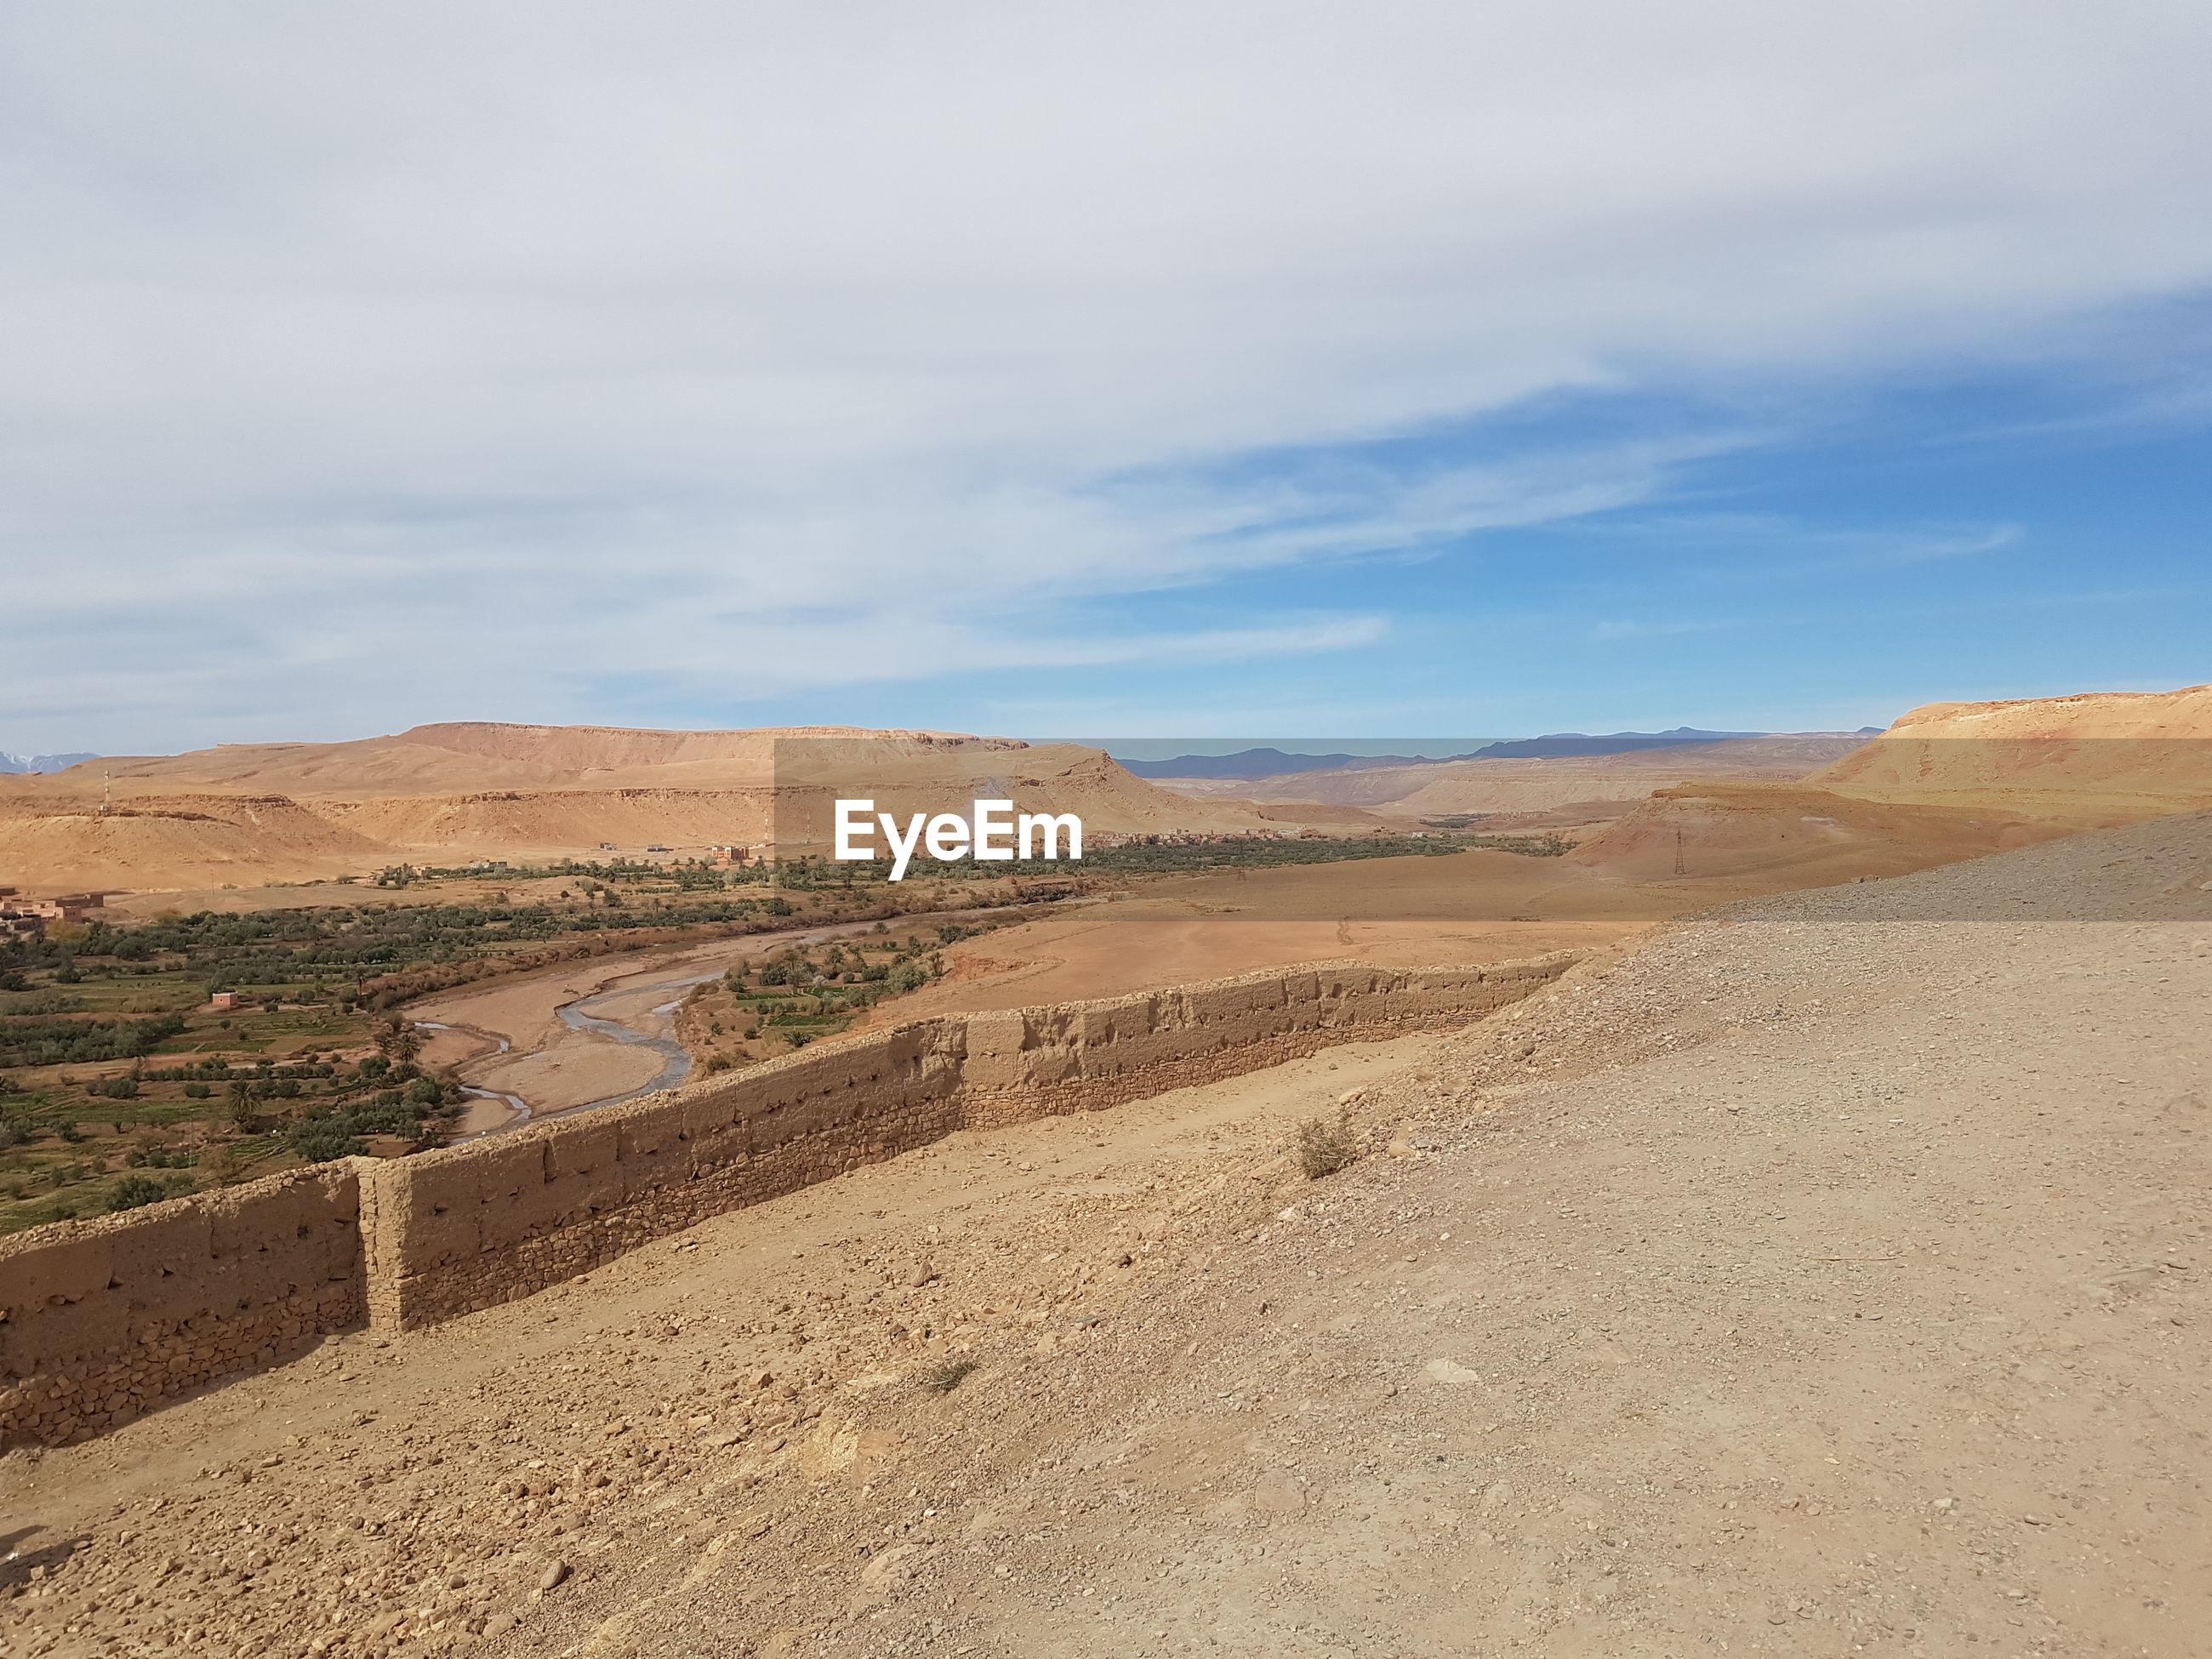 VIEW OF DESERT ROAD AGAINST SKY